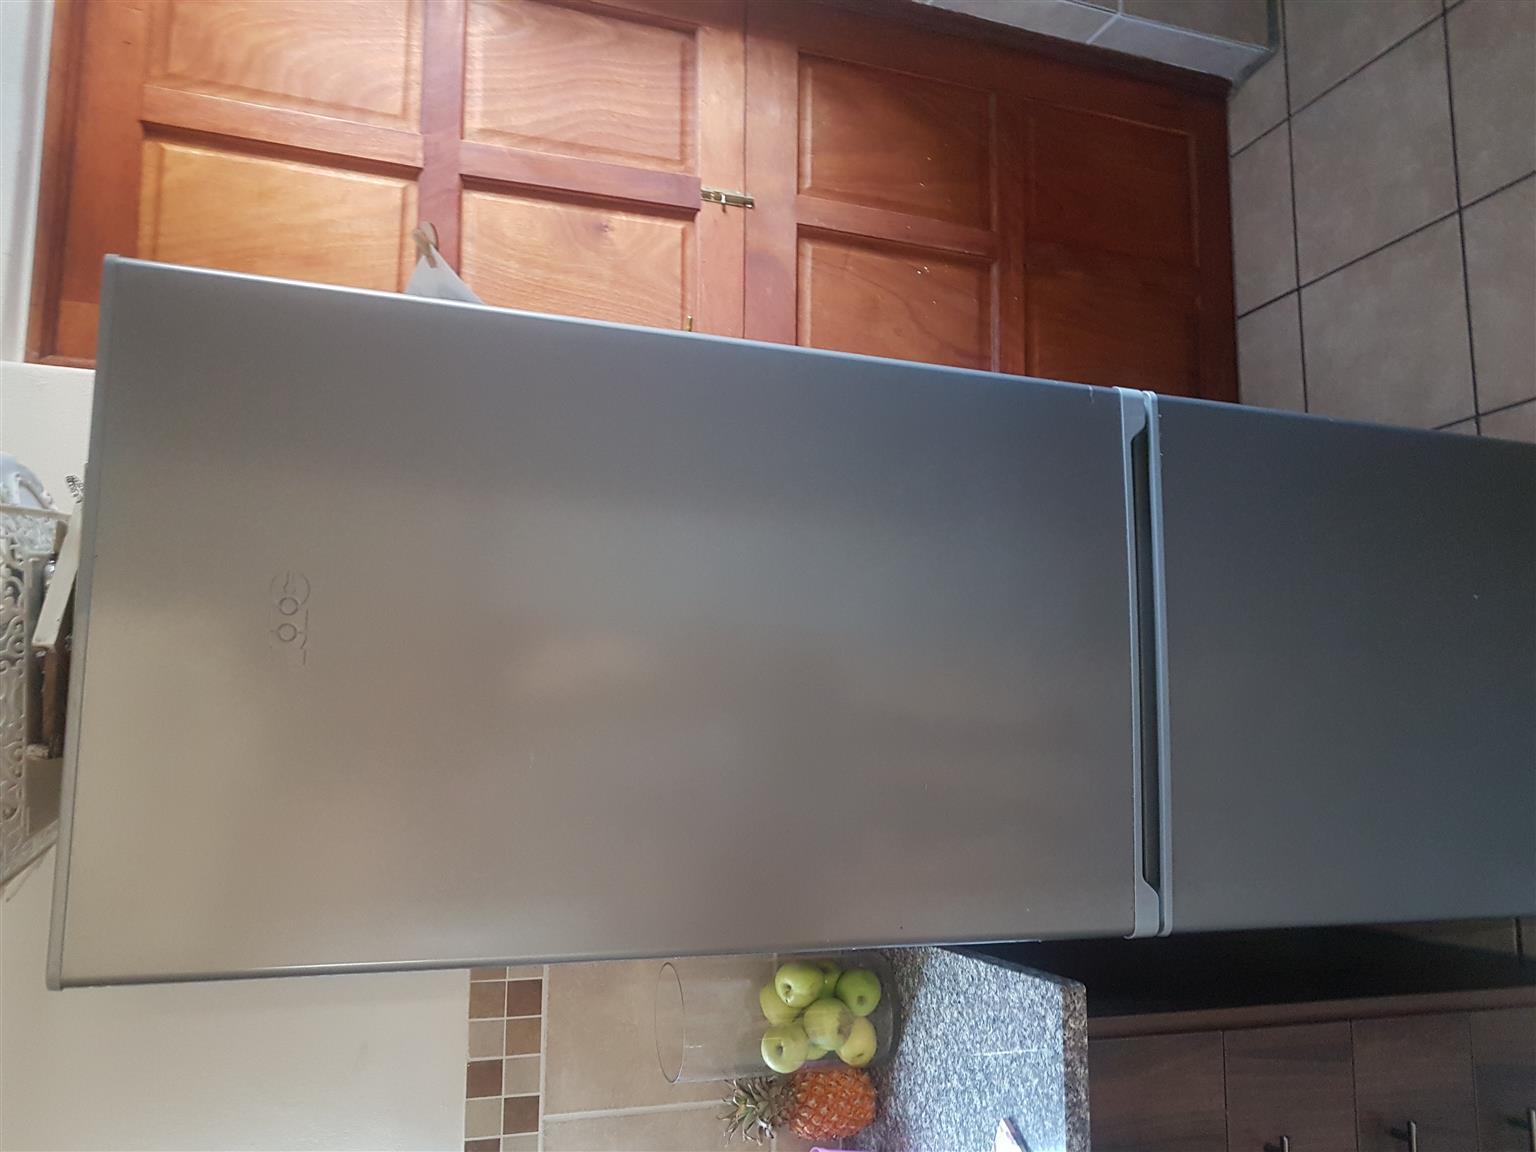 Kic fridge freezee for sale